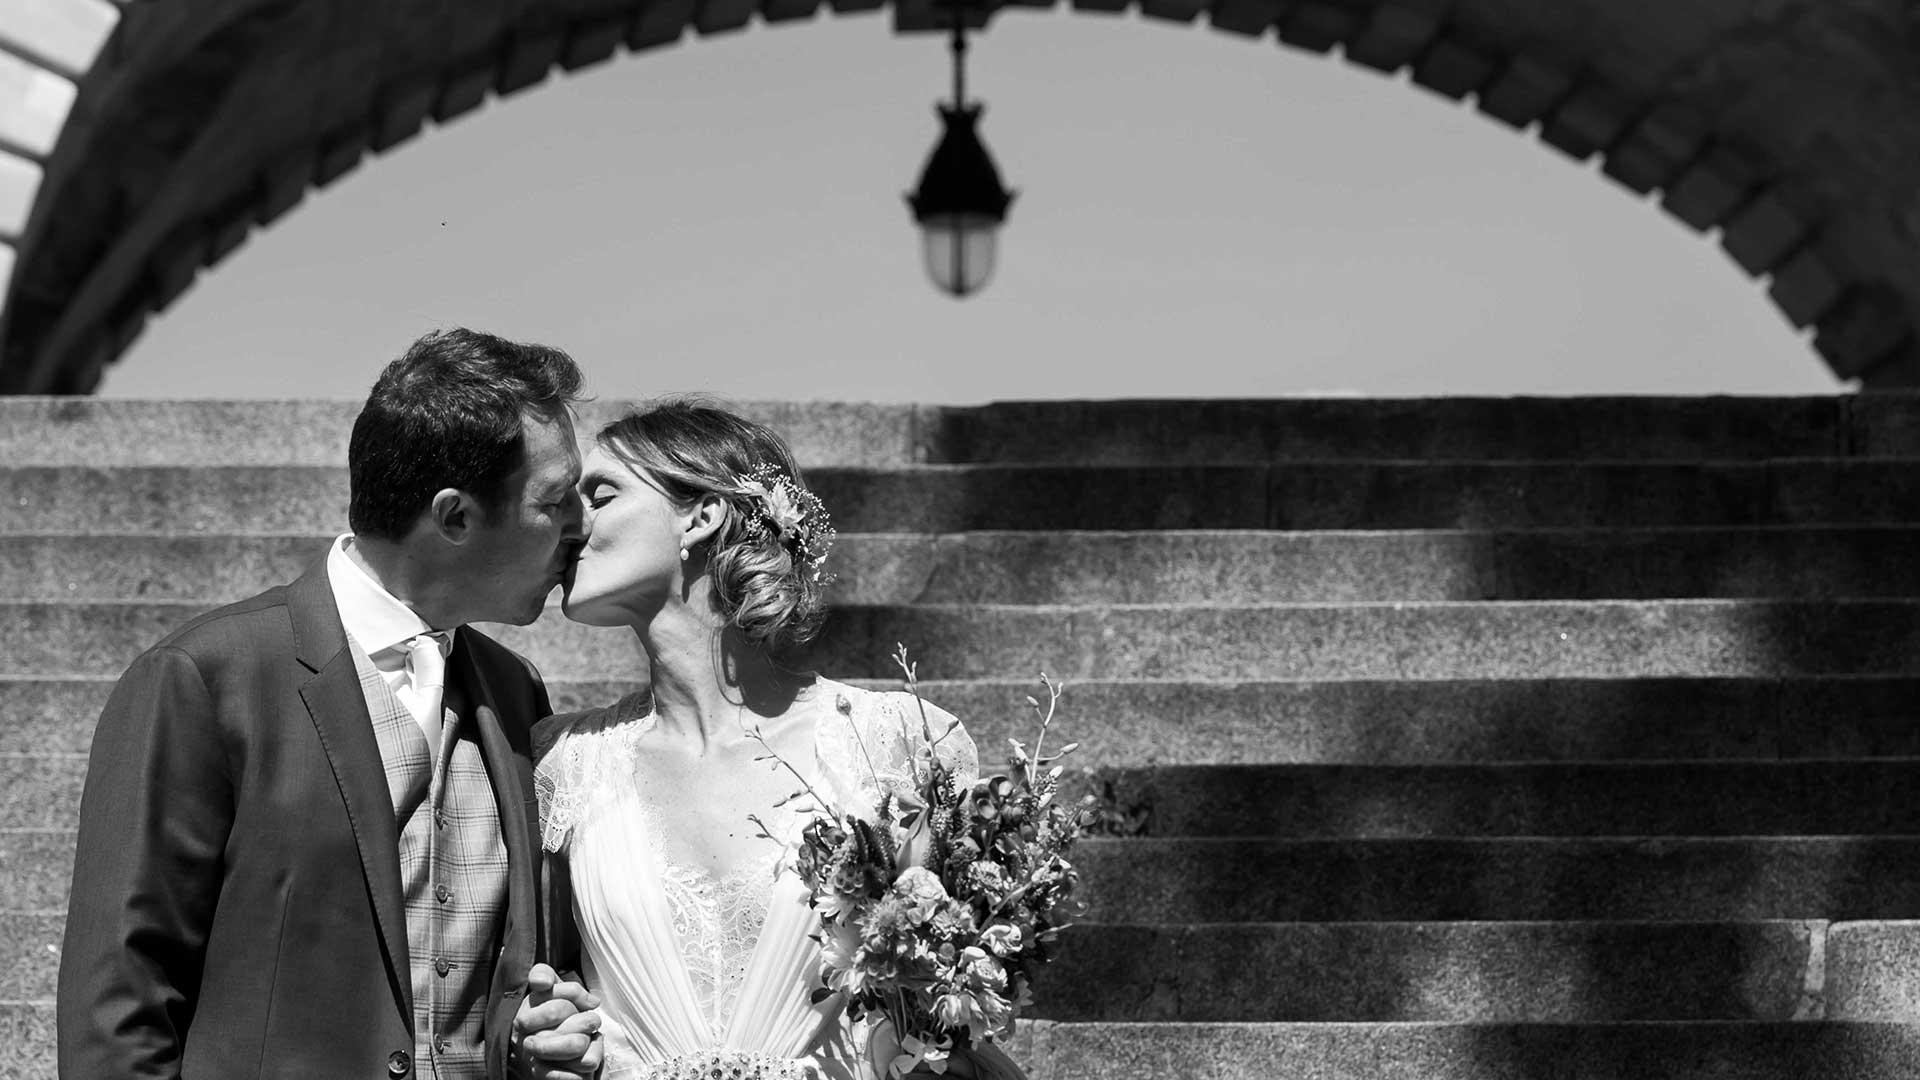 photographe-mariage-paris-23-NB